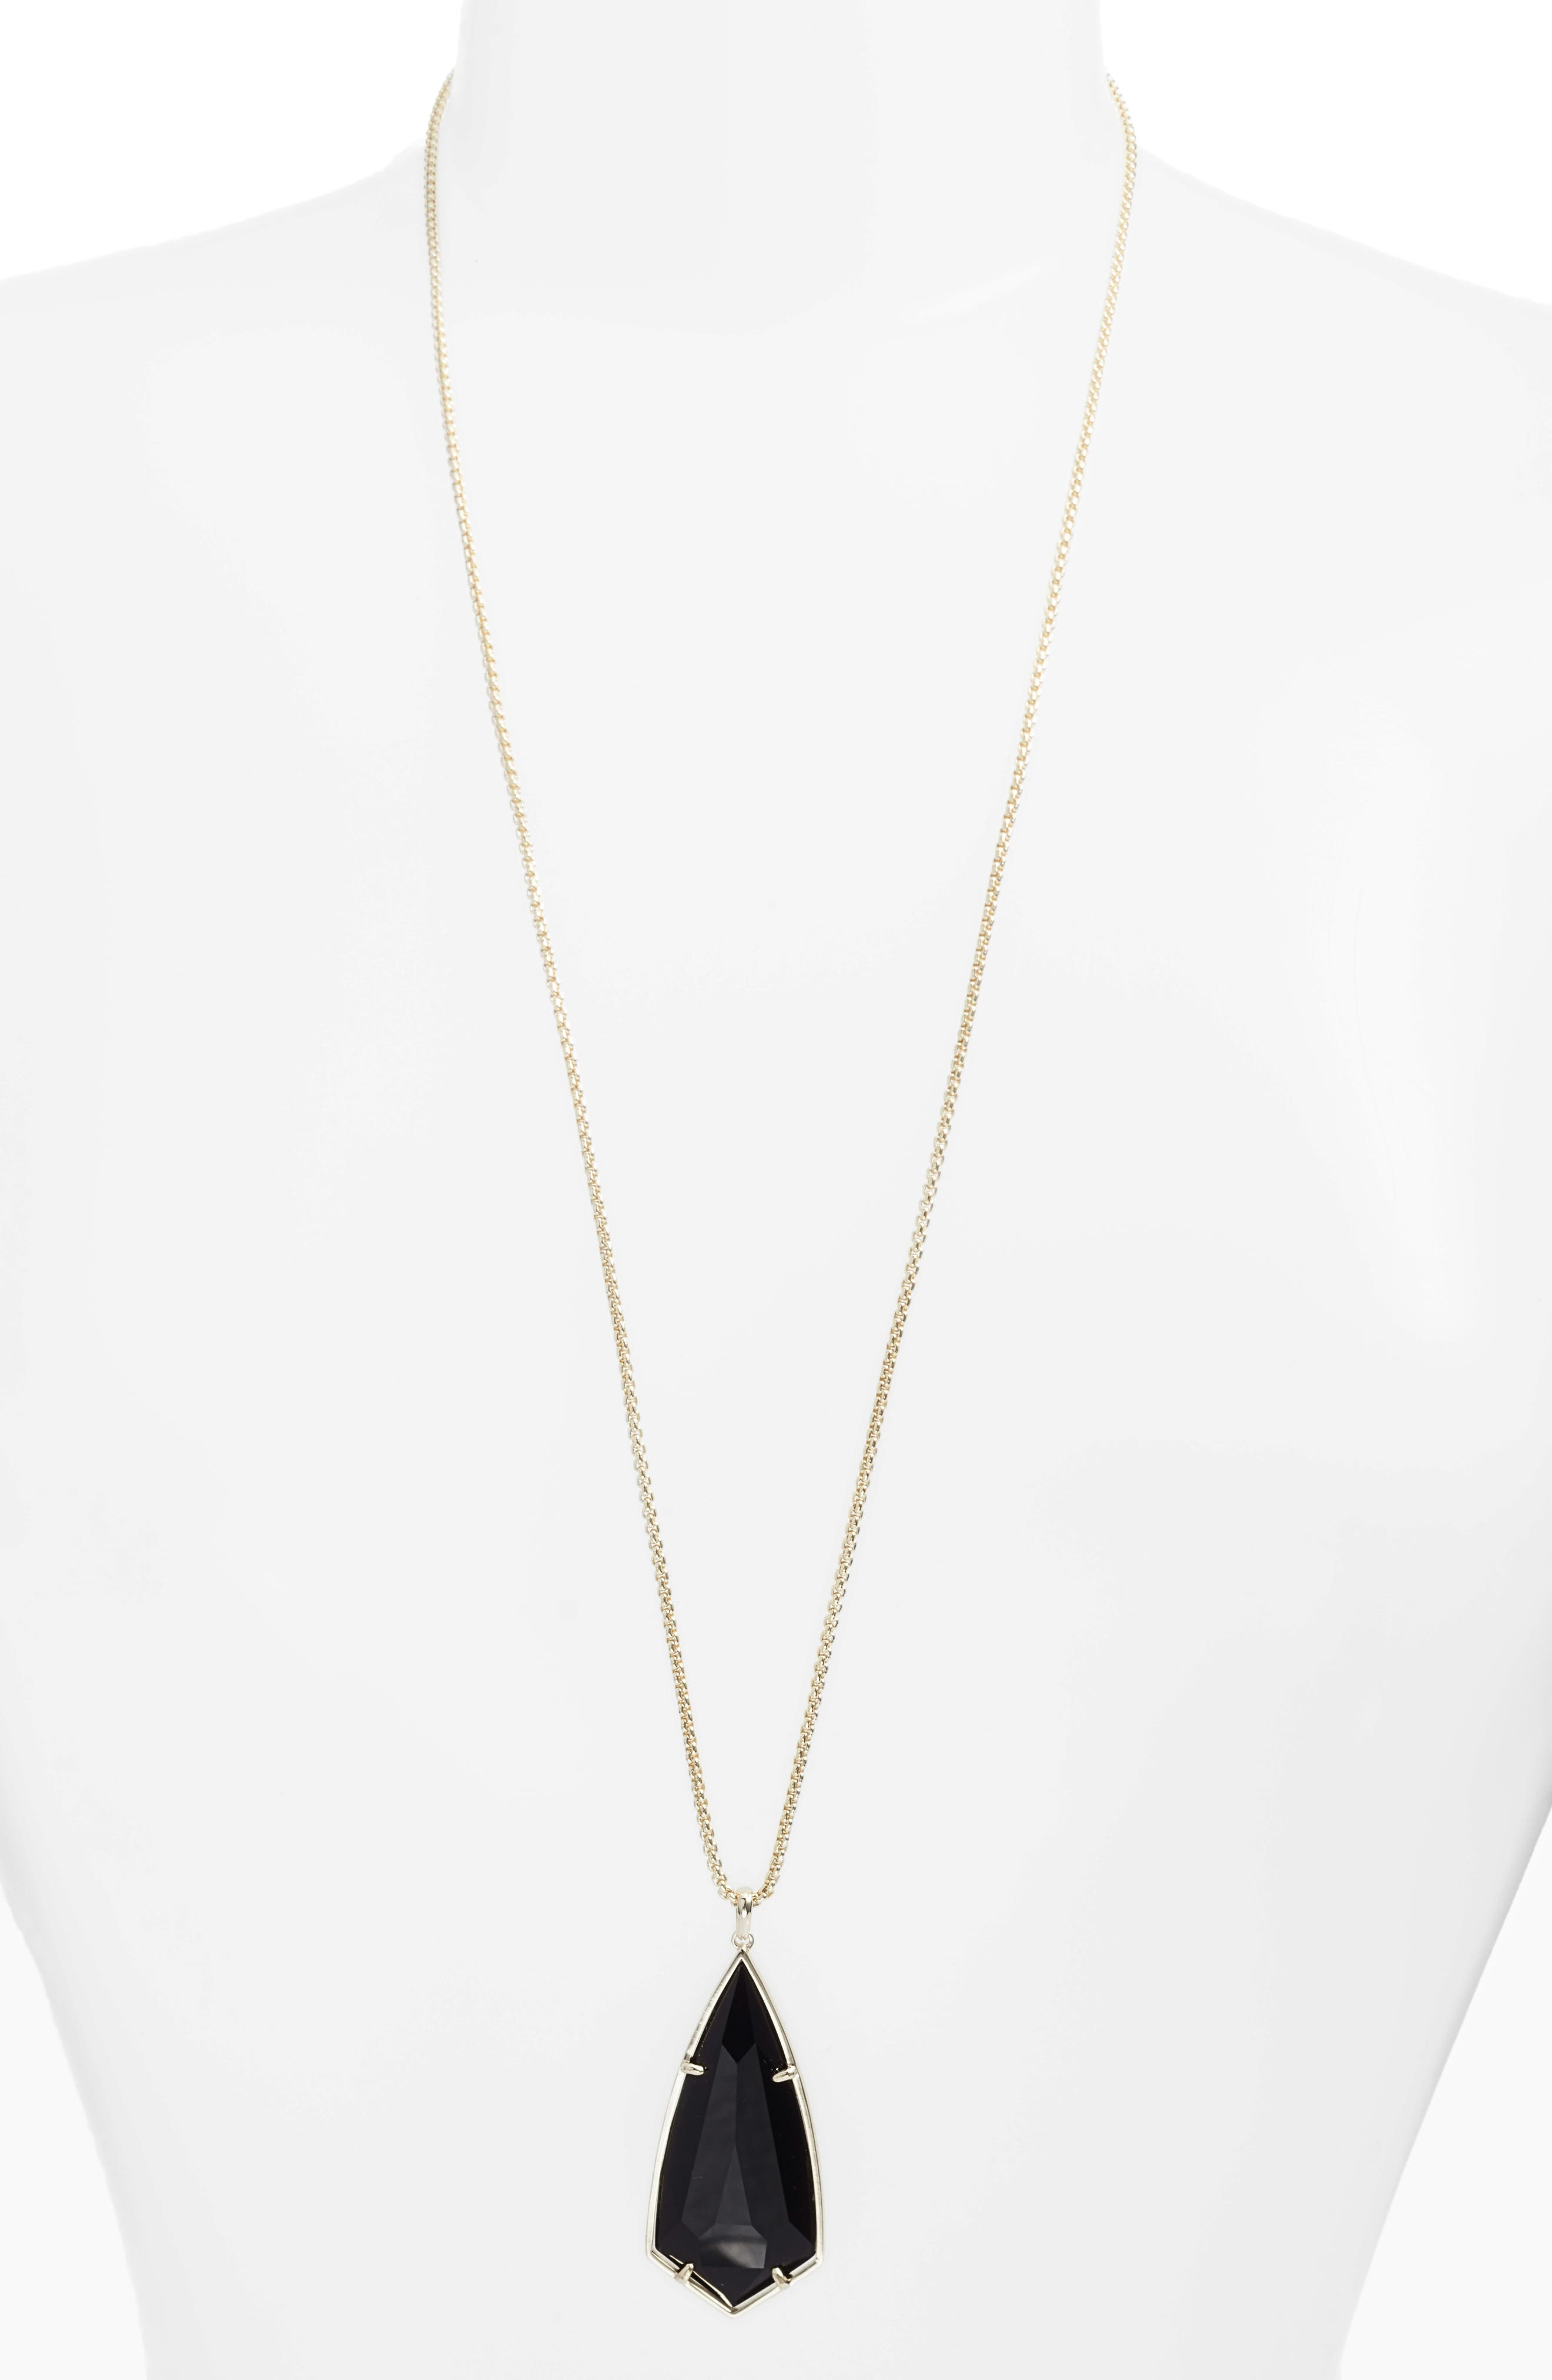 Alternate Image 1 Selected - Kendra Scott 'Carole' Long Semiprecious Stone Pendant Necklace